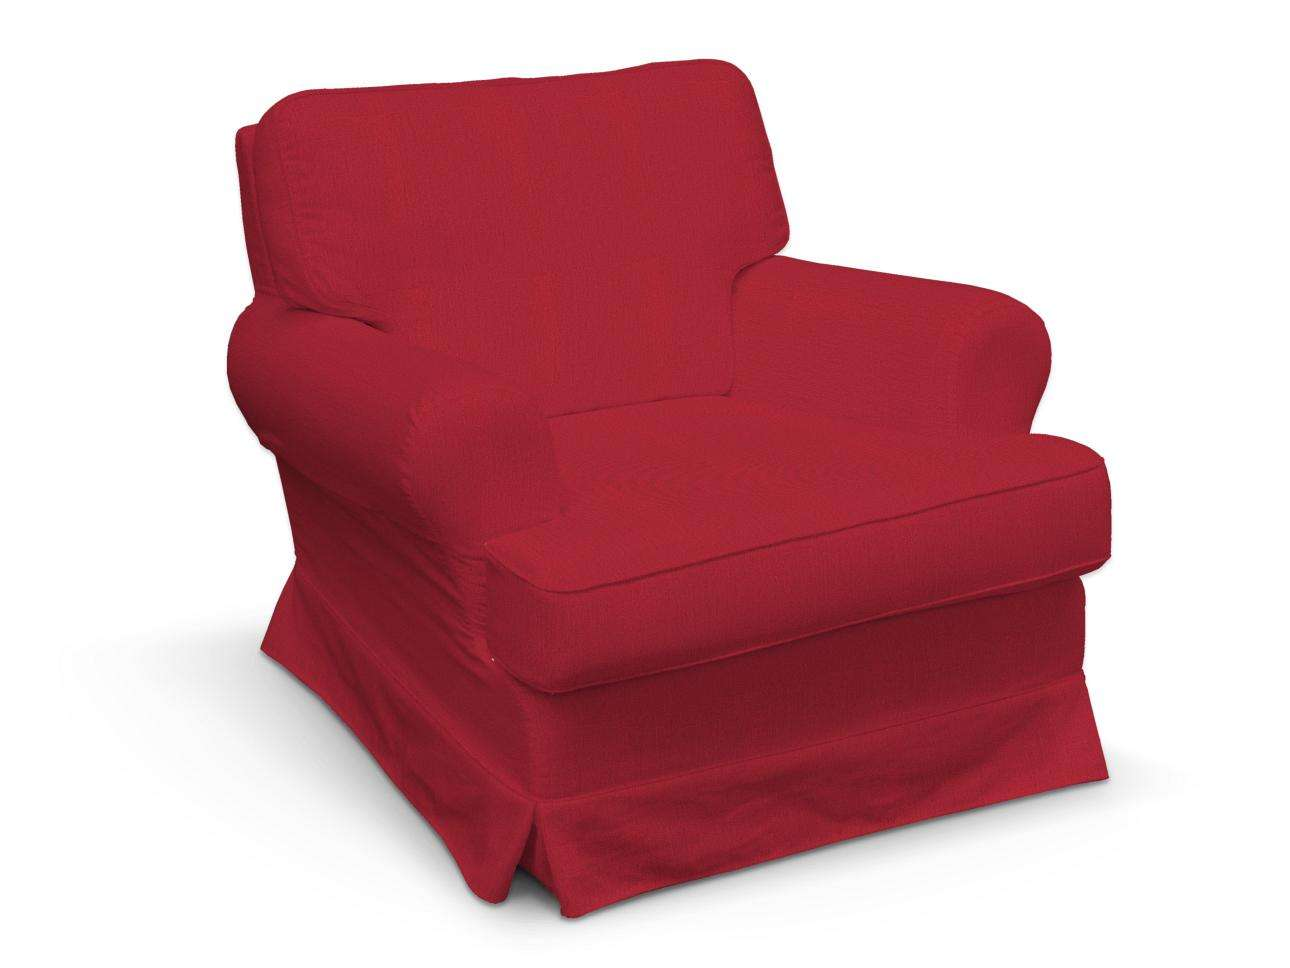 Pokrowiec na fotel Barkaby fotel Barkaby w kolekcji Chenille, tkanina: 702-24